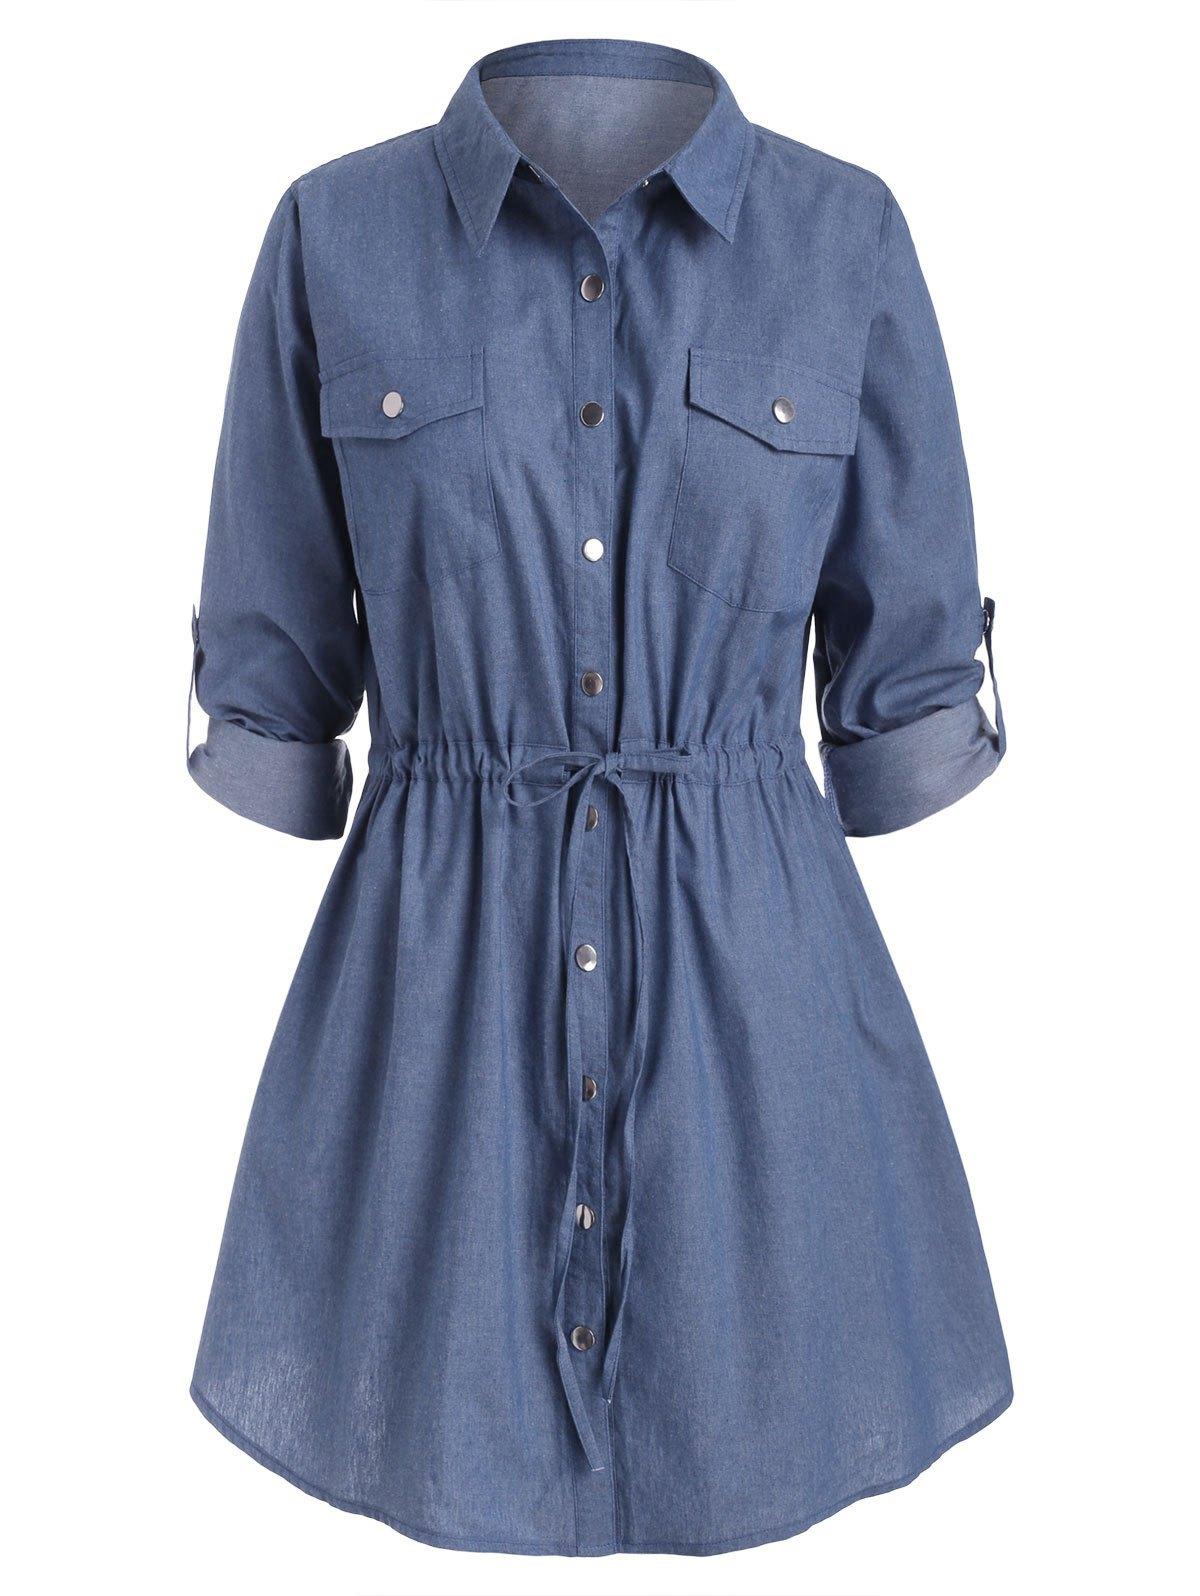 Plus Size Waist Drawstring Chambray Snap Button Shirt Dress